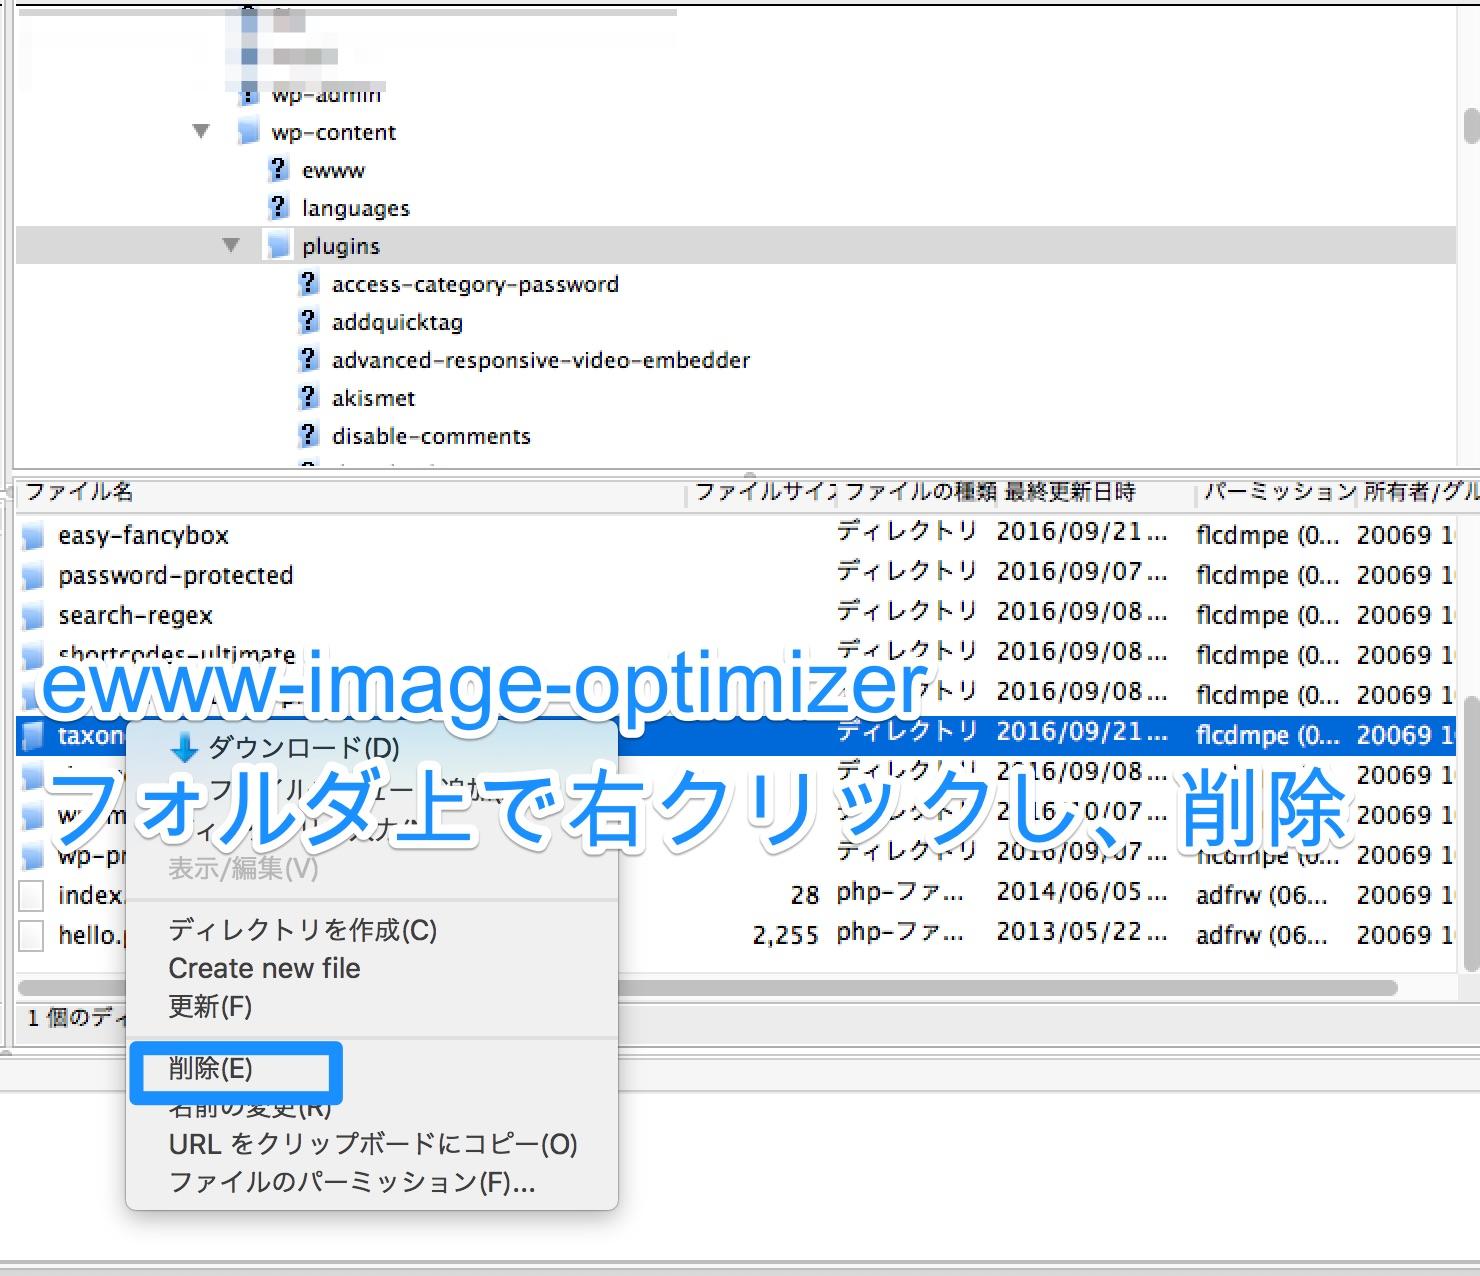 ewww image optimizerをアップグレードしたらWordPressが表示されなくなった!